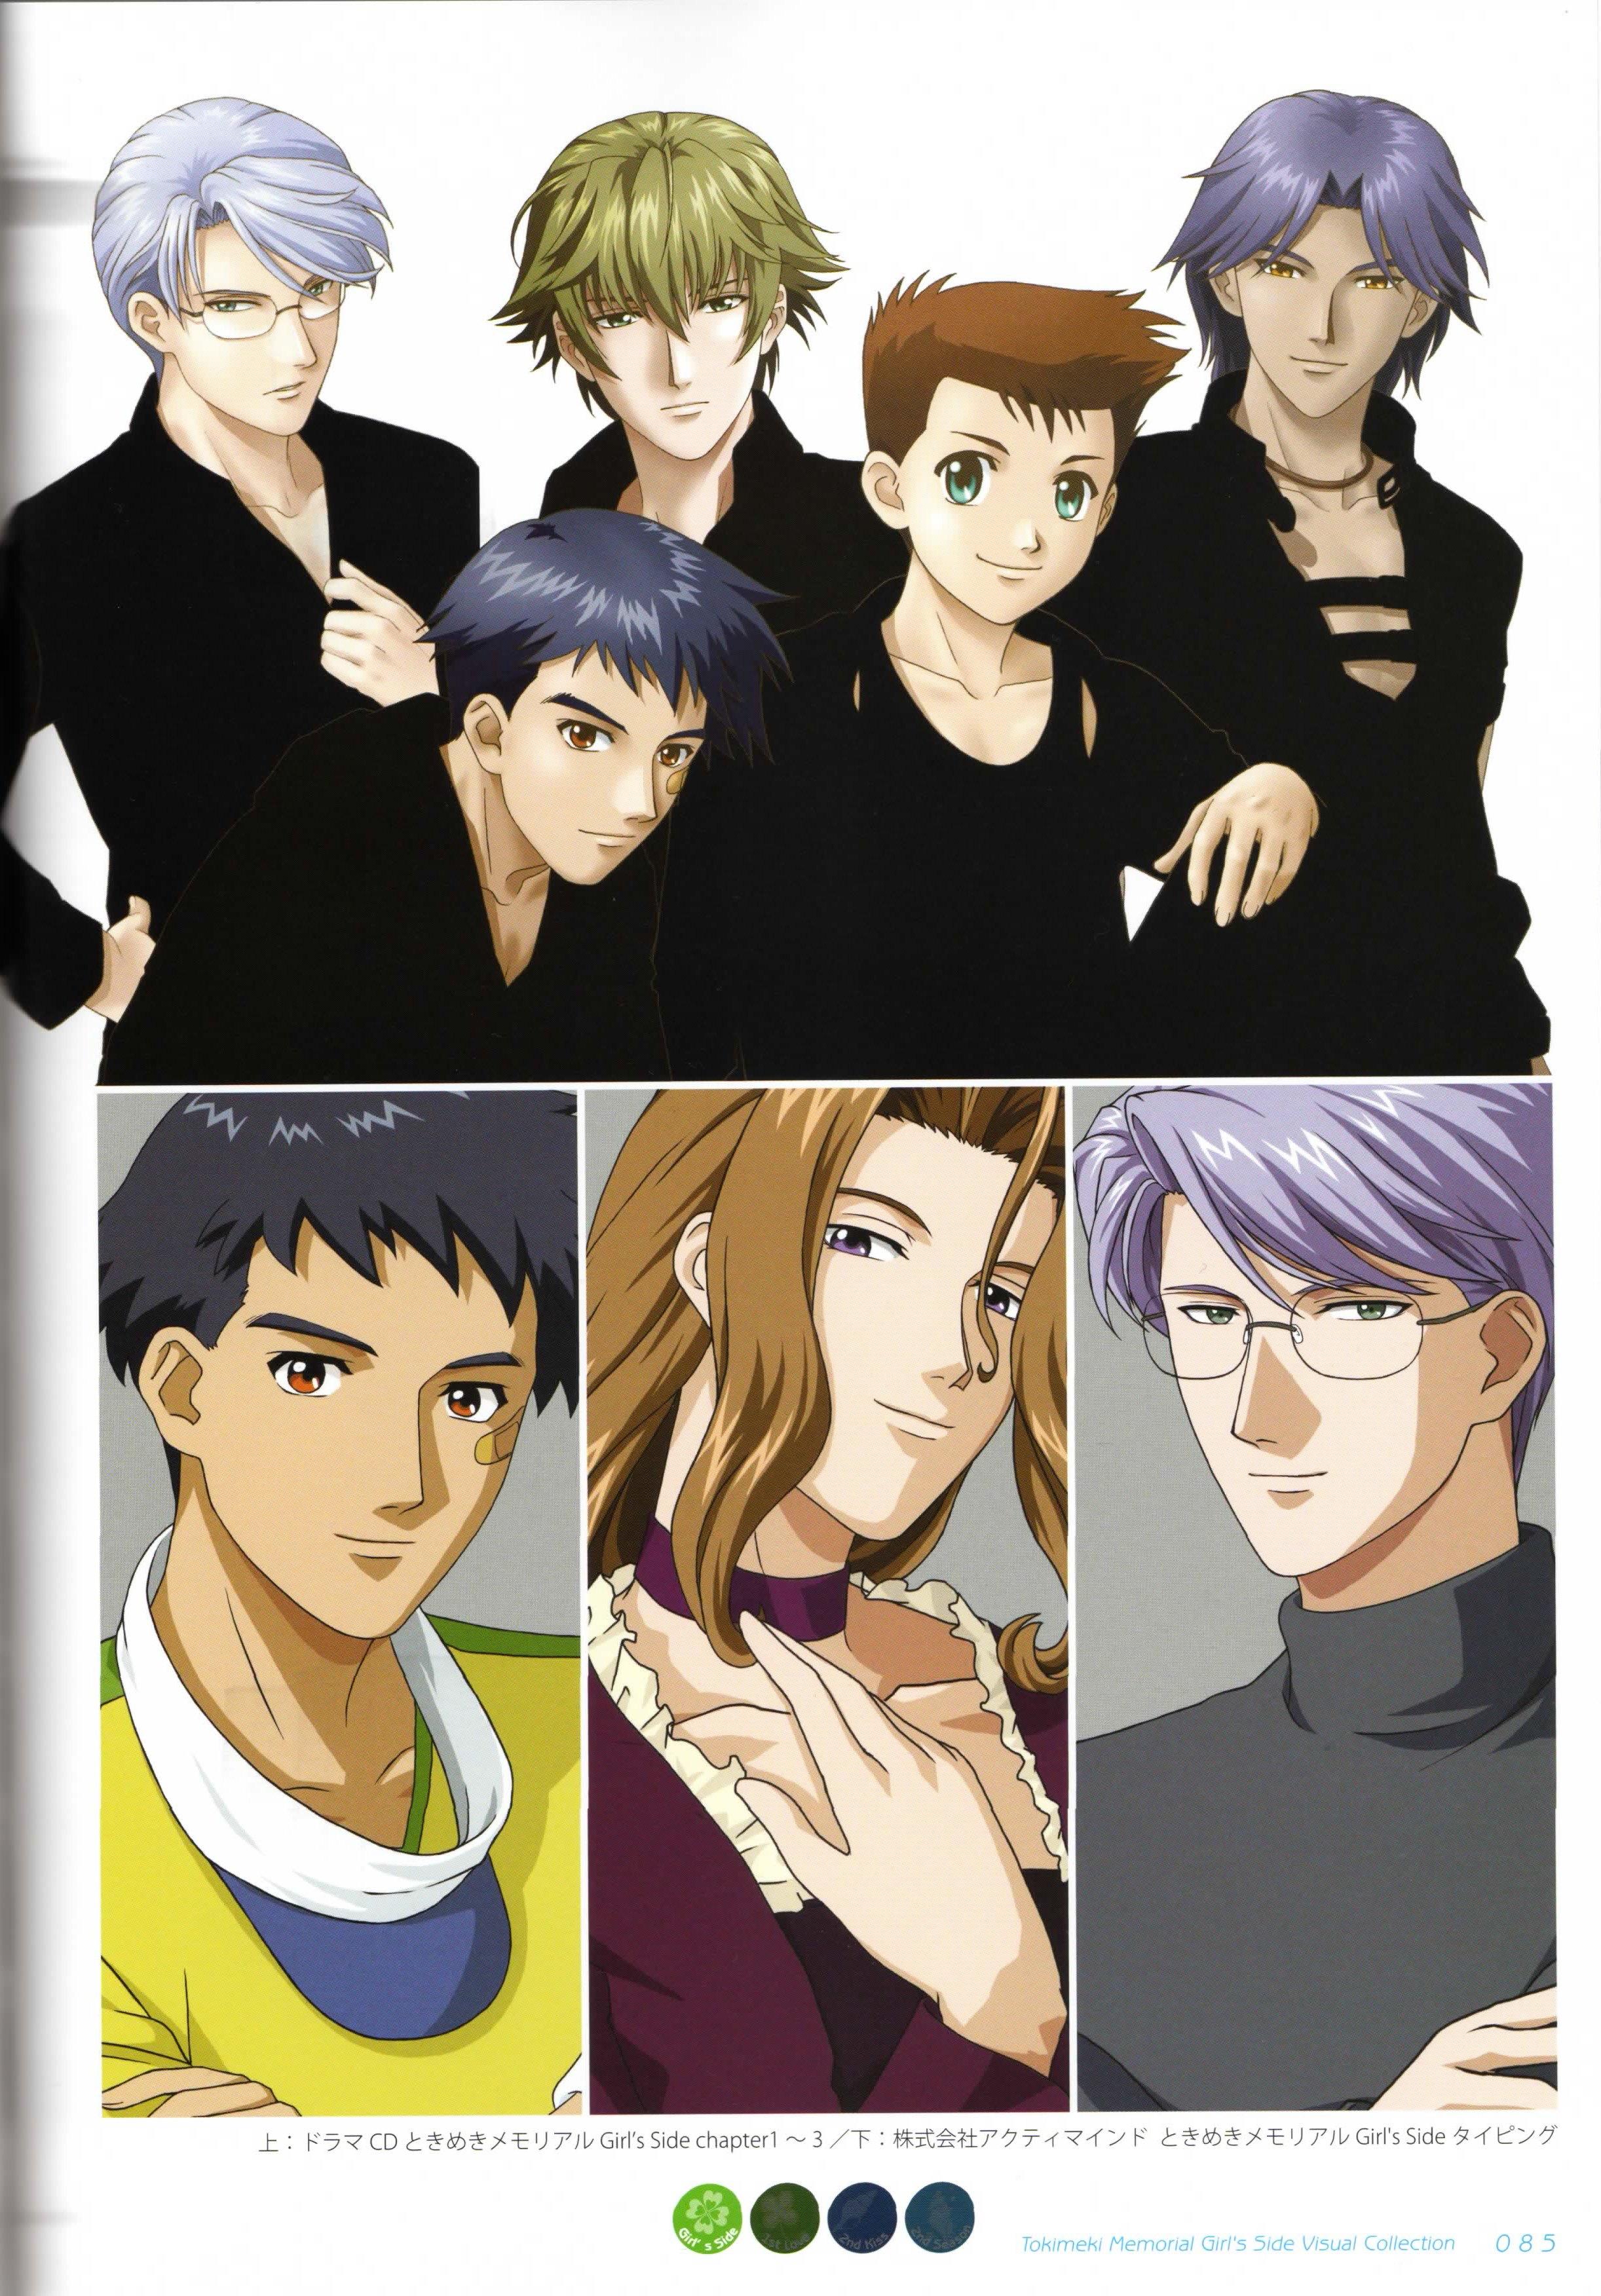 Tokimeki Memorial Girl S Side 1st Love Image 477148 Zerochan Anime Image Board